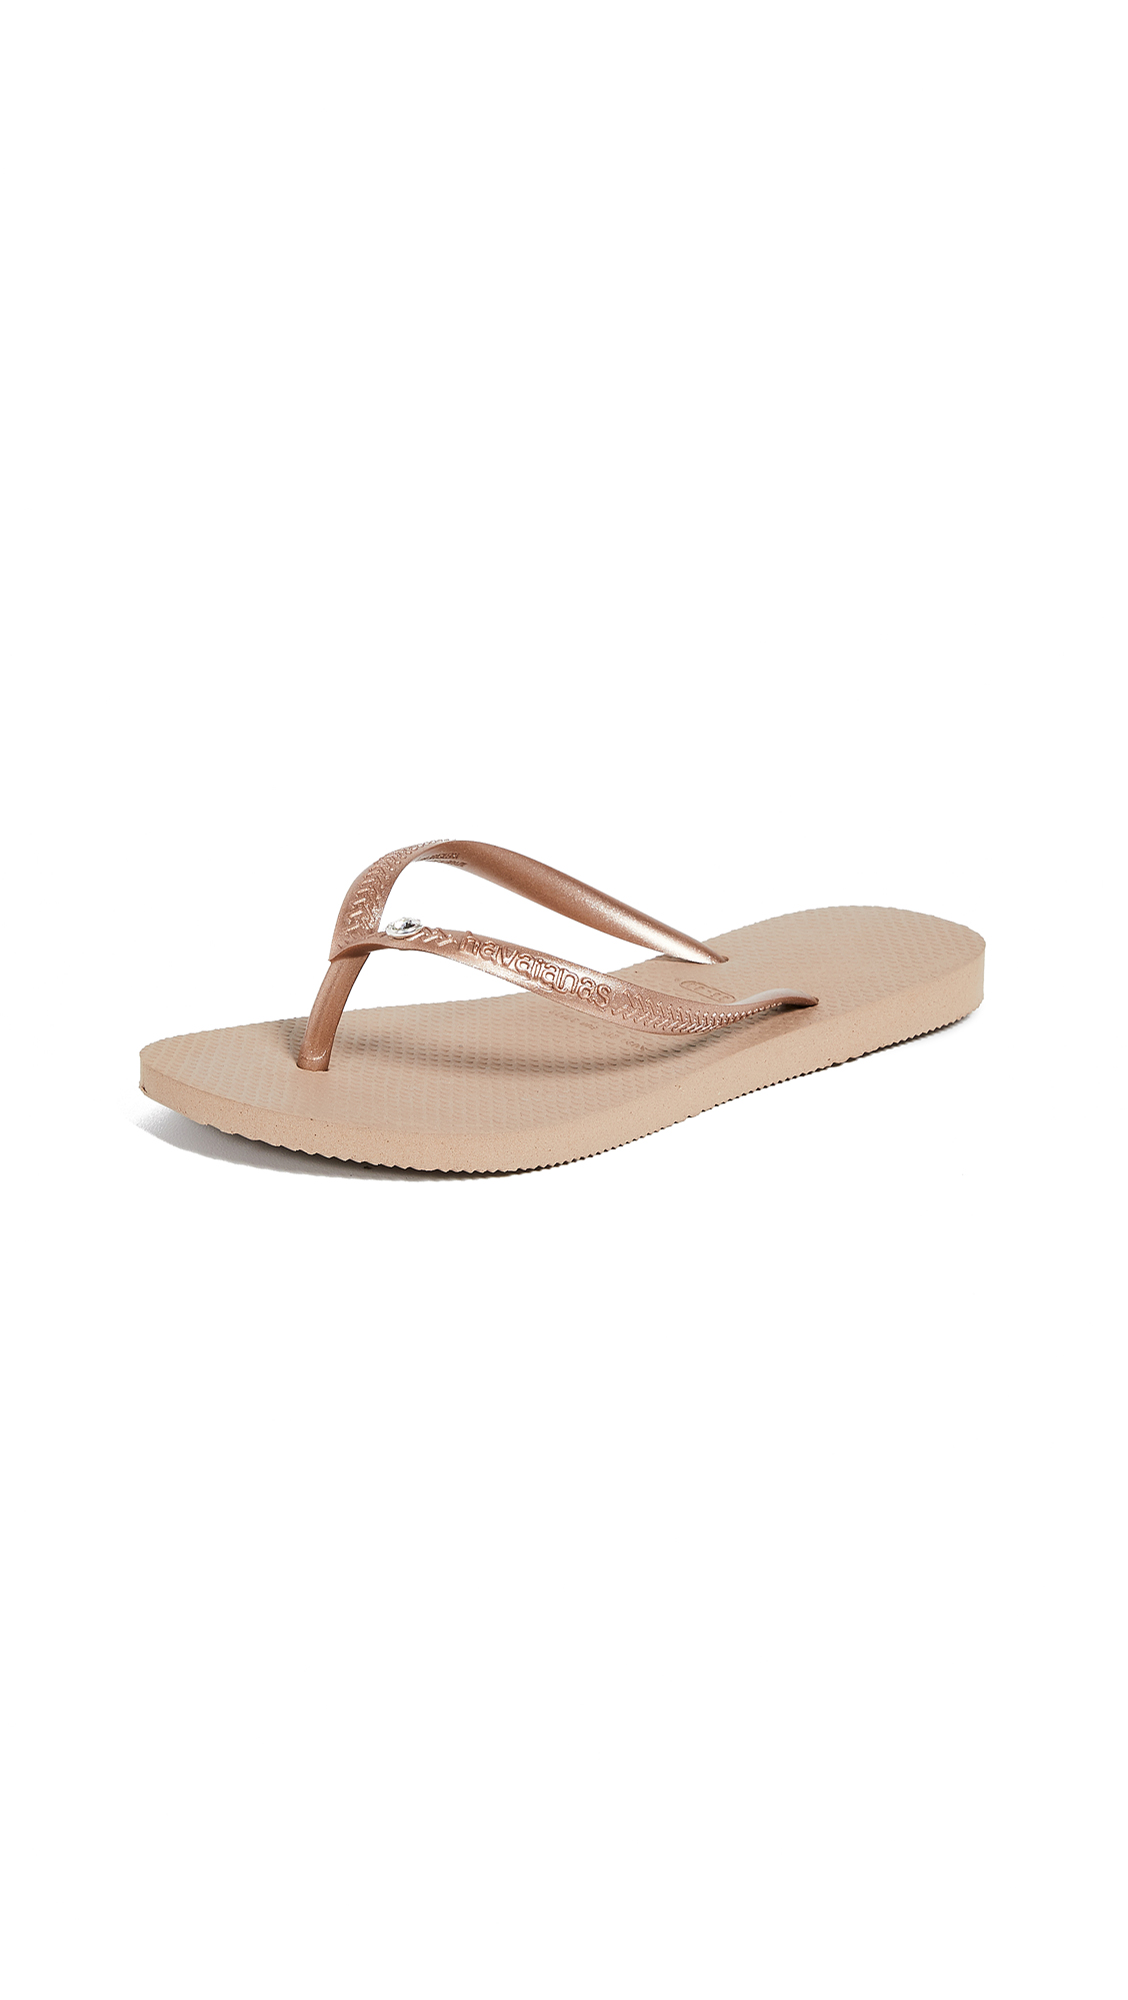 Havaianas Slim Crystal Glamour Flip Flops - Rose Gold